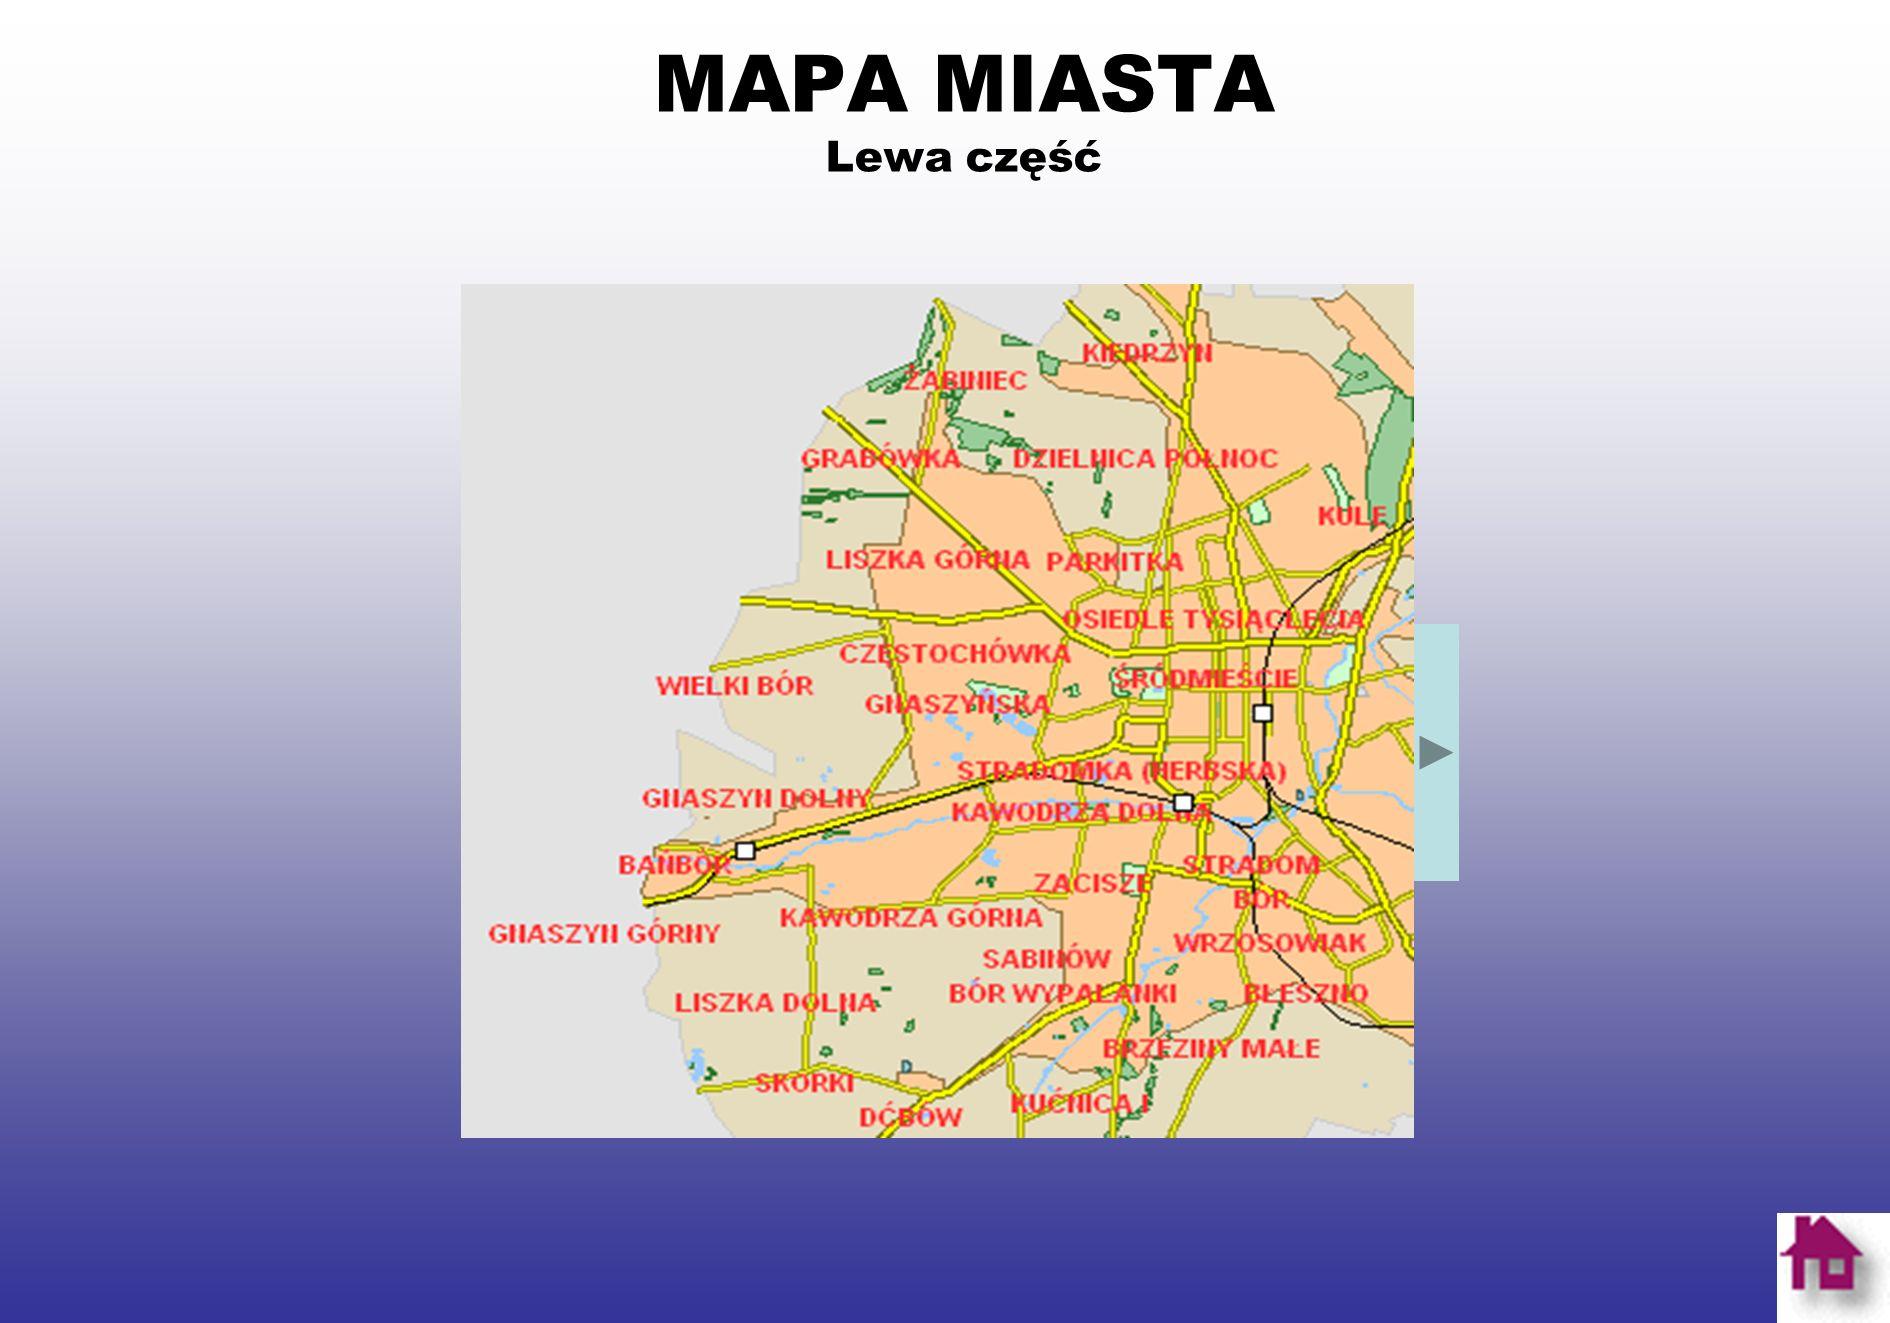 MAPA MIASTA Prawa część miasta